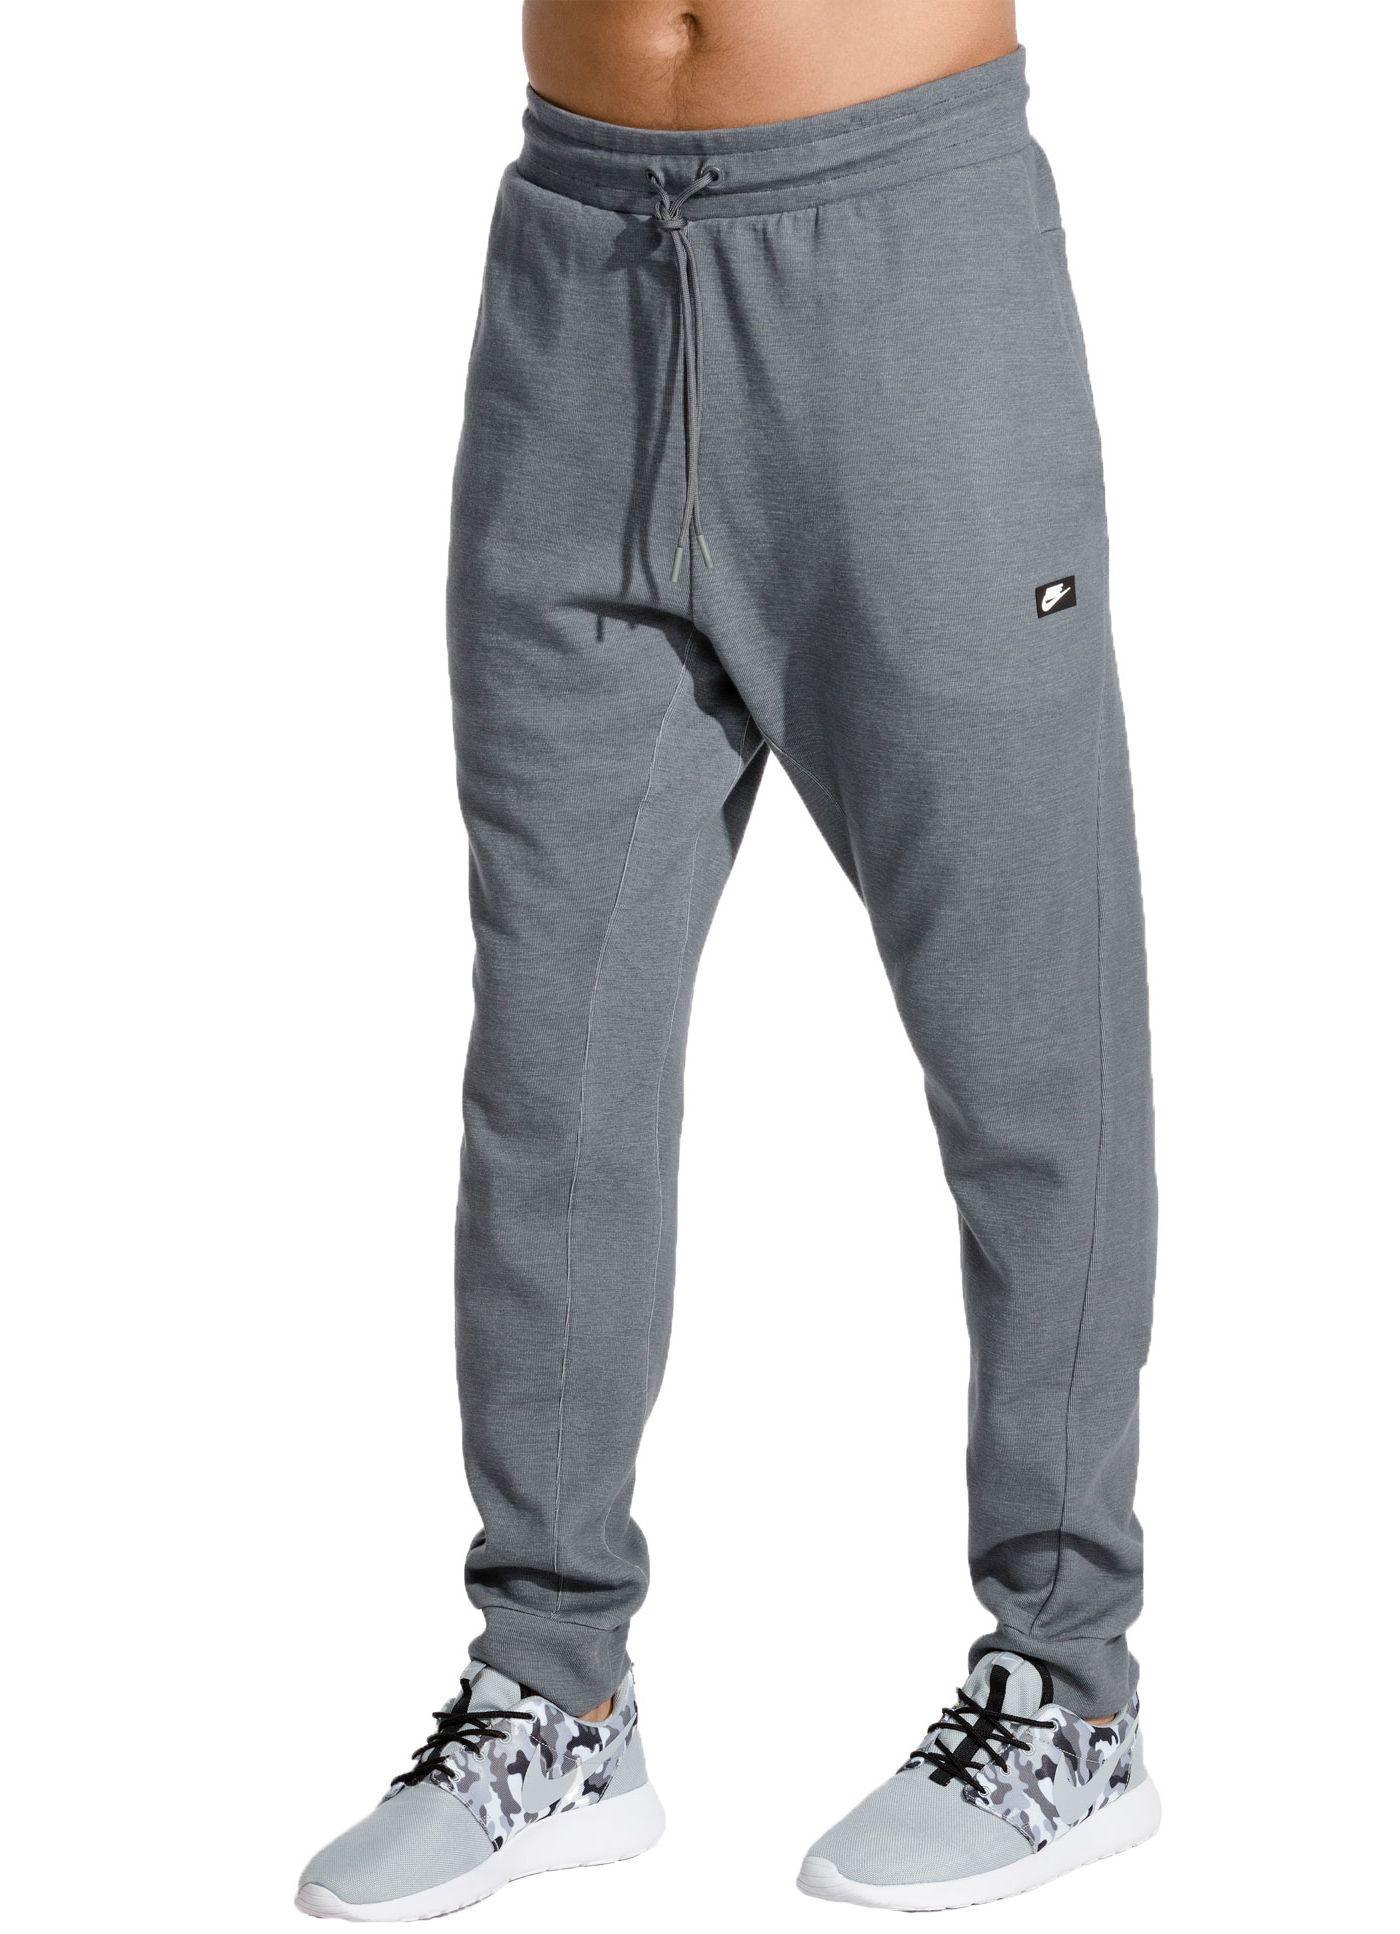 Nike Men's Sportswear Optic Jogger Pants